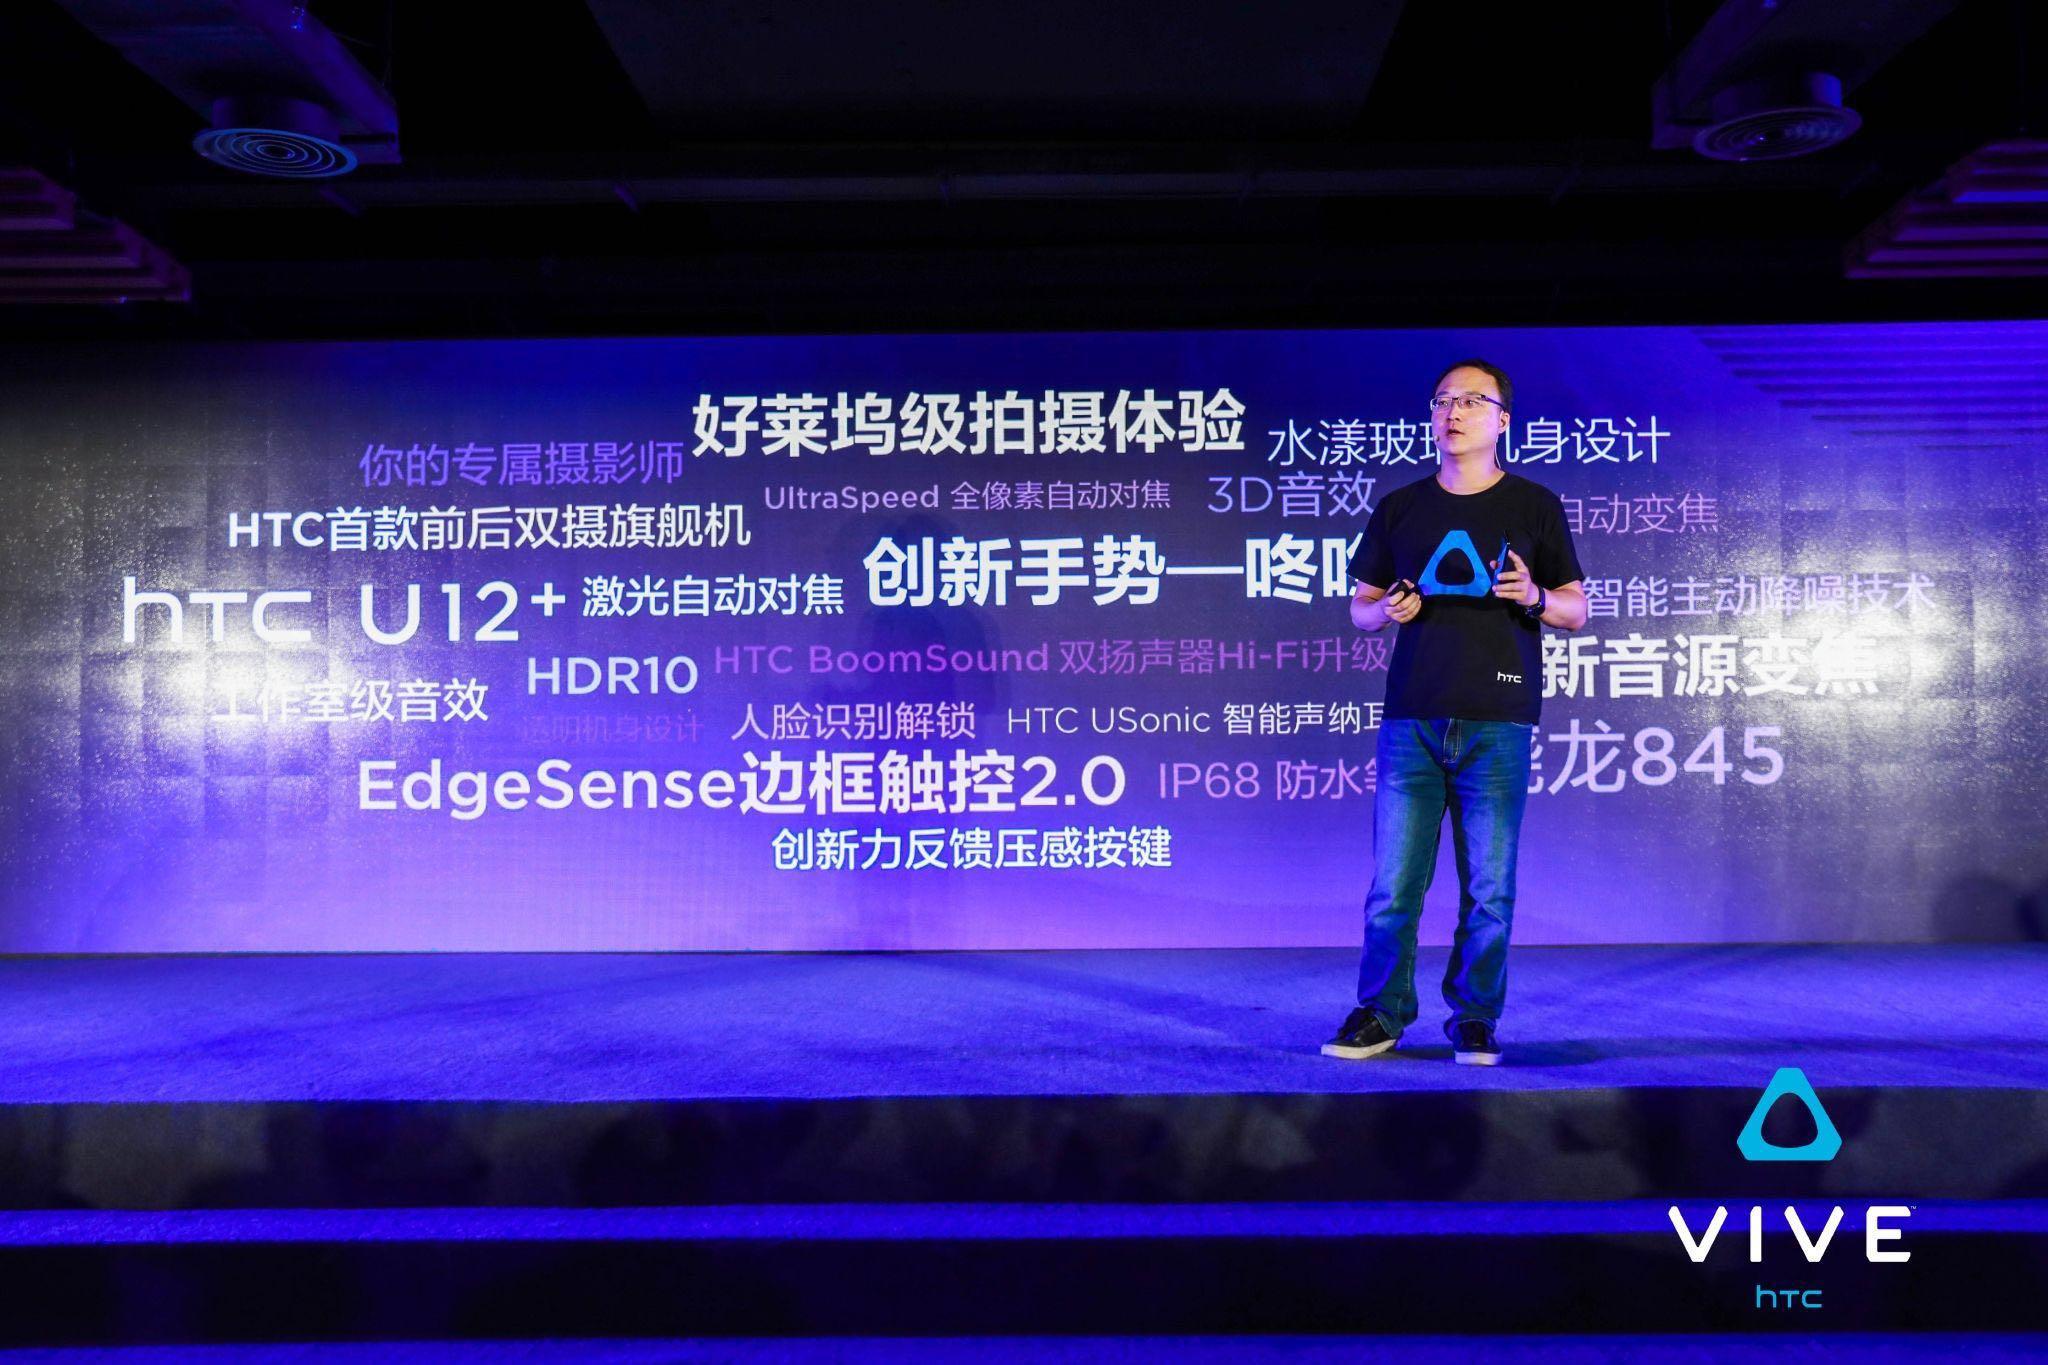 HTC U12+正式发布:骁龙845加持 DXO测103分